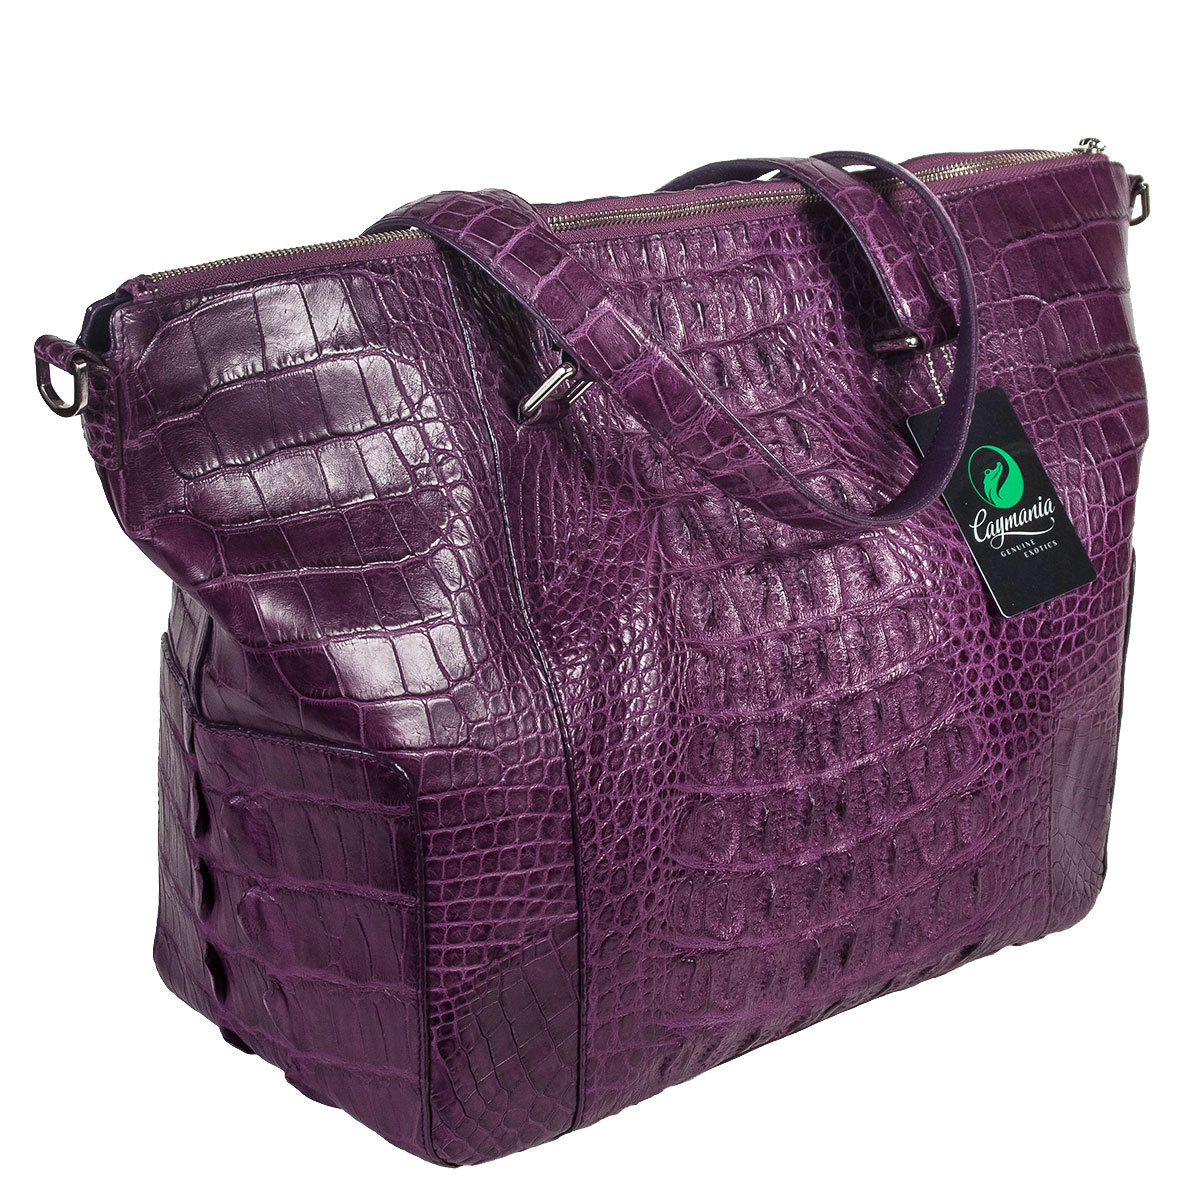 d80c4fa0b3a2 Женская сумка из кожи крокодила фиолетовая | Артикул: WHC7141VT